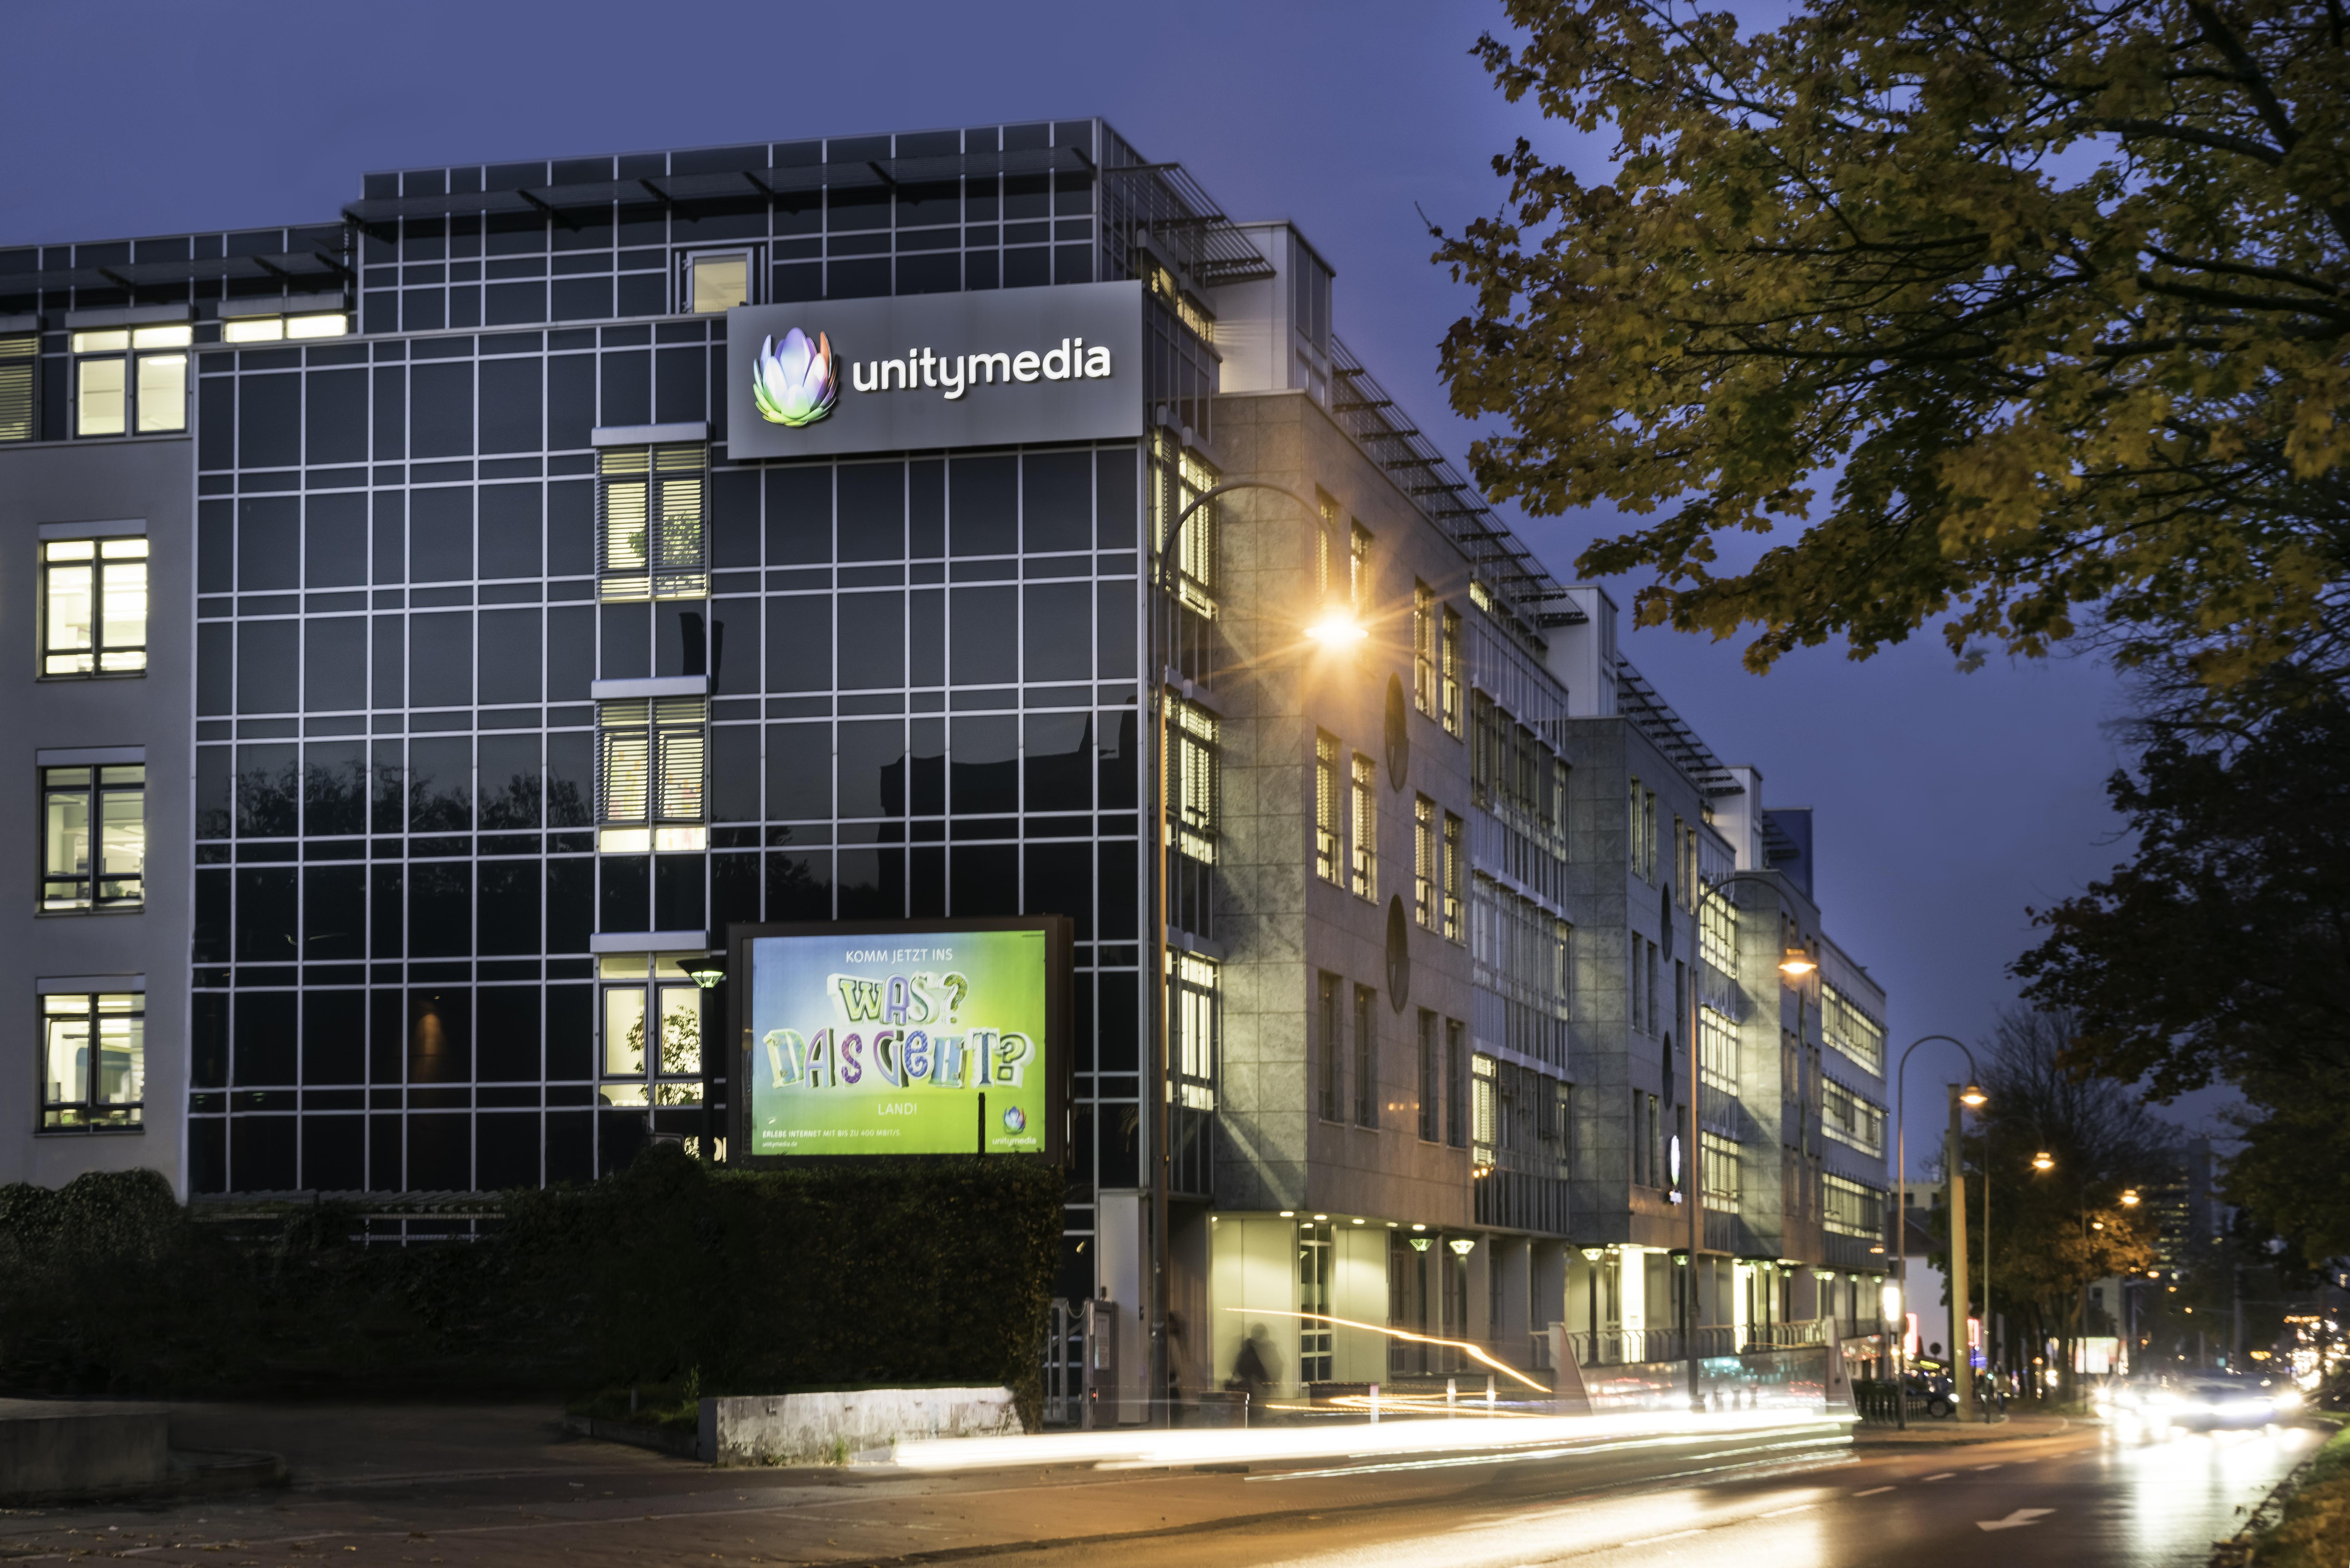 unitymedia registrieren